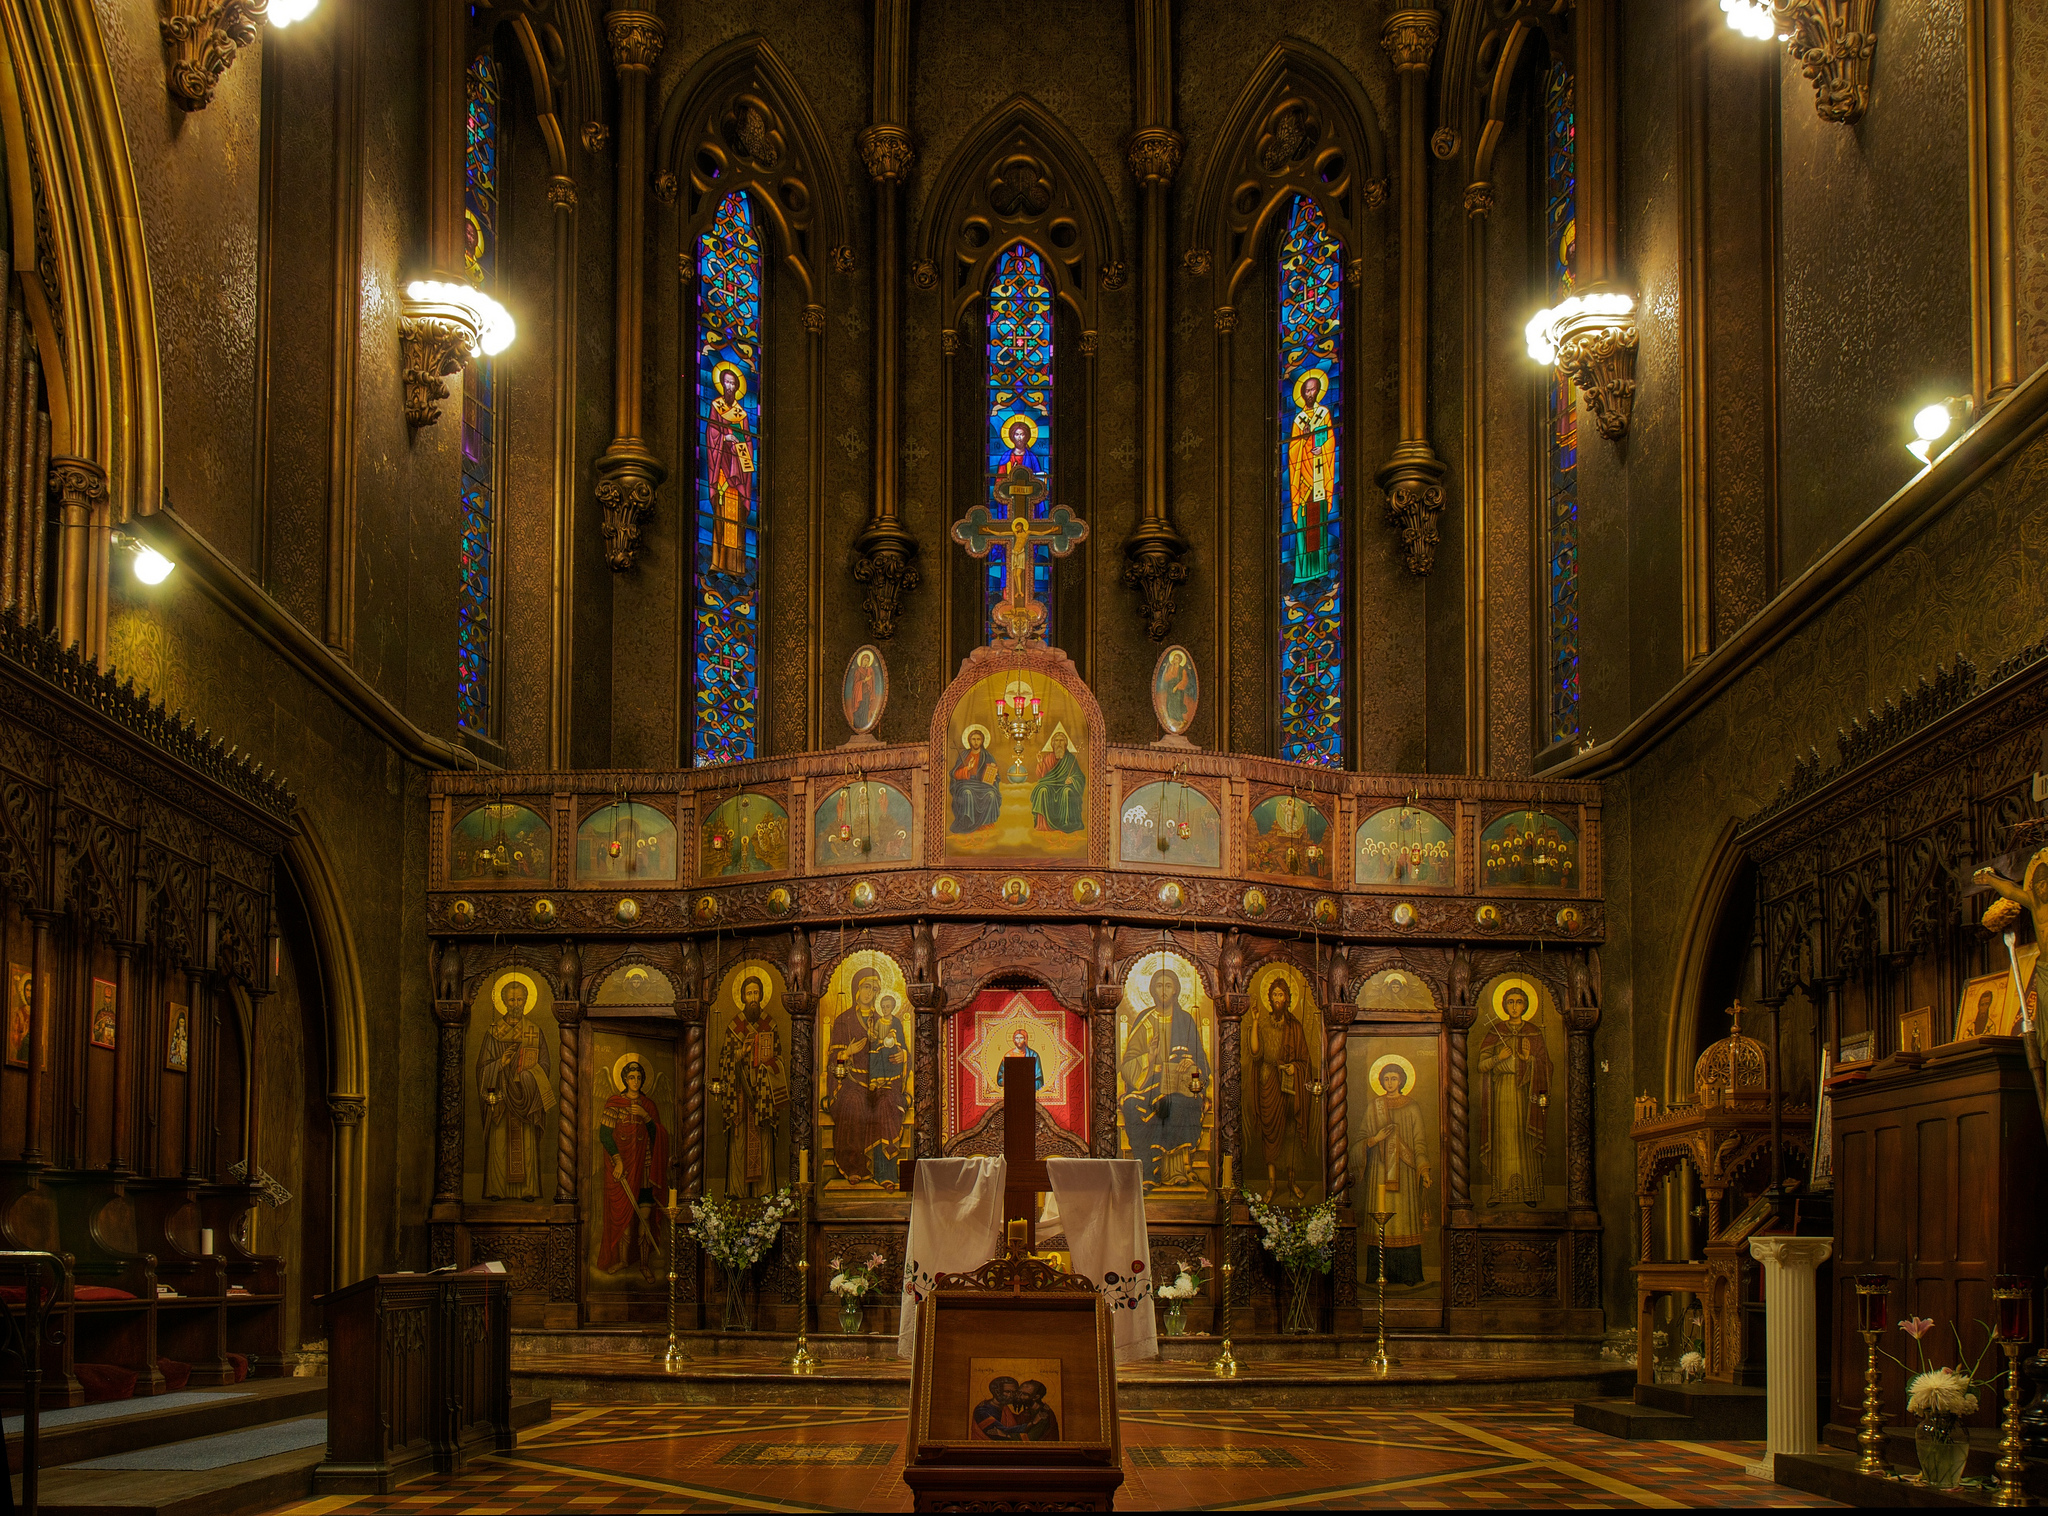 Cathedral interior, Kent G. Becker